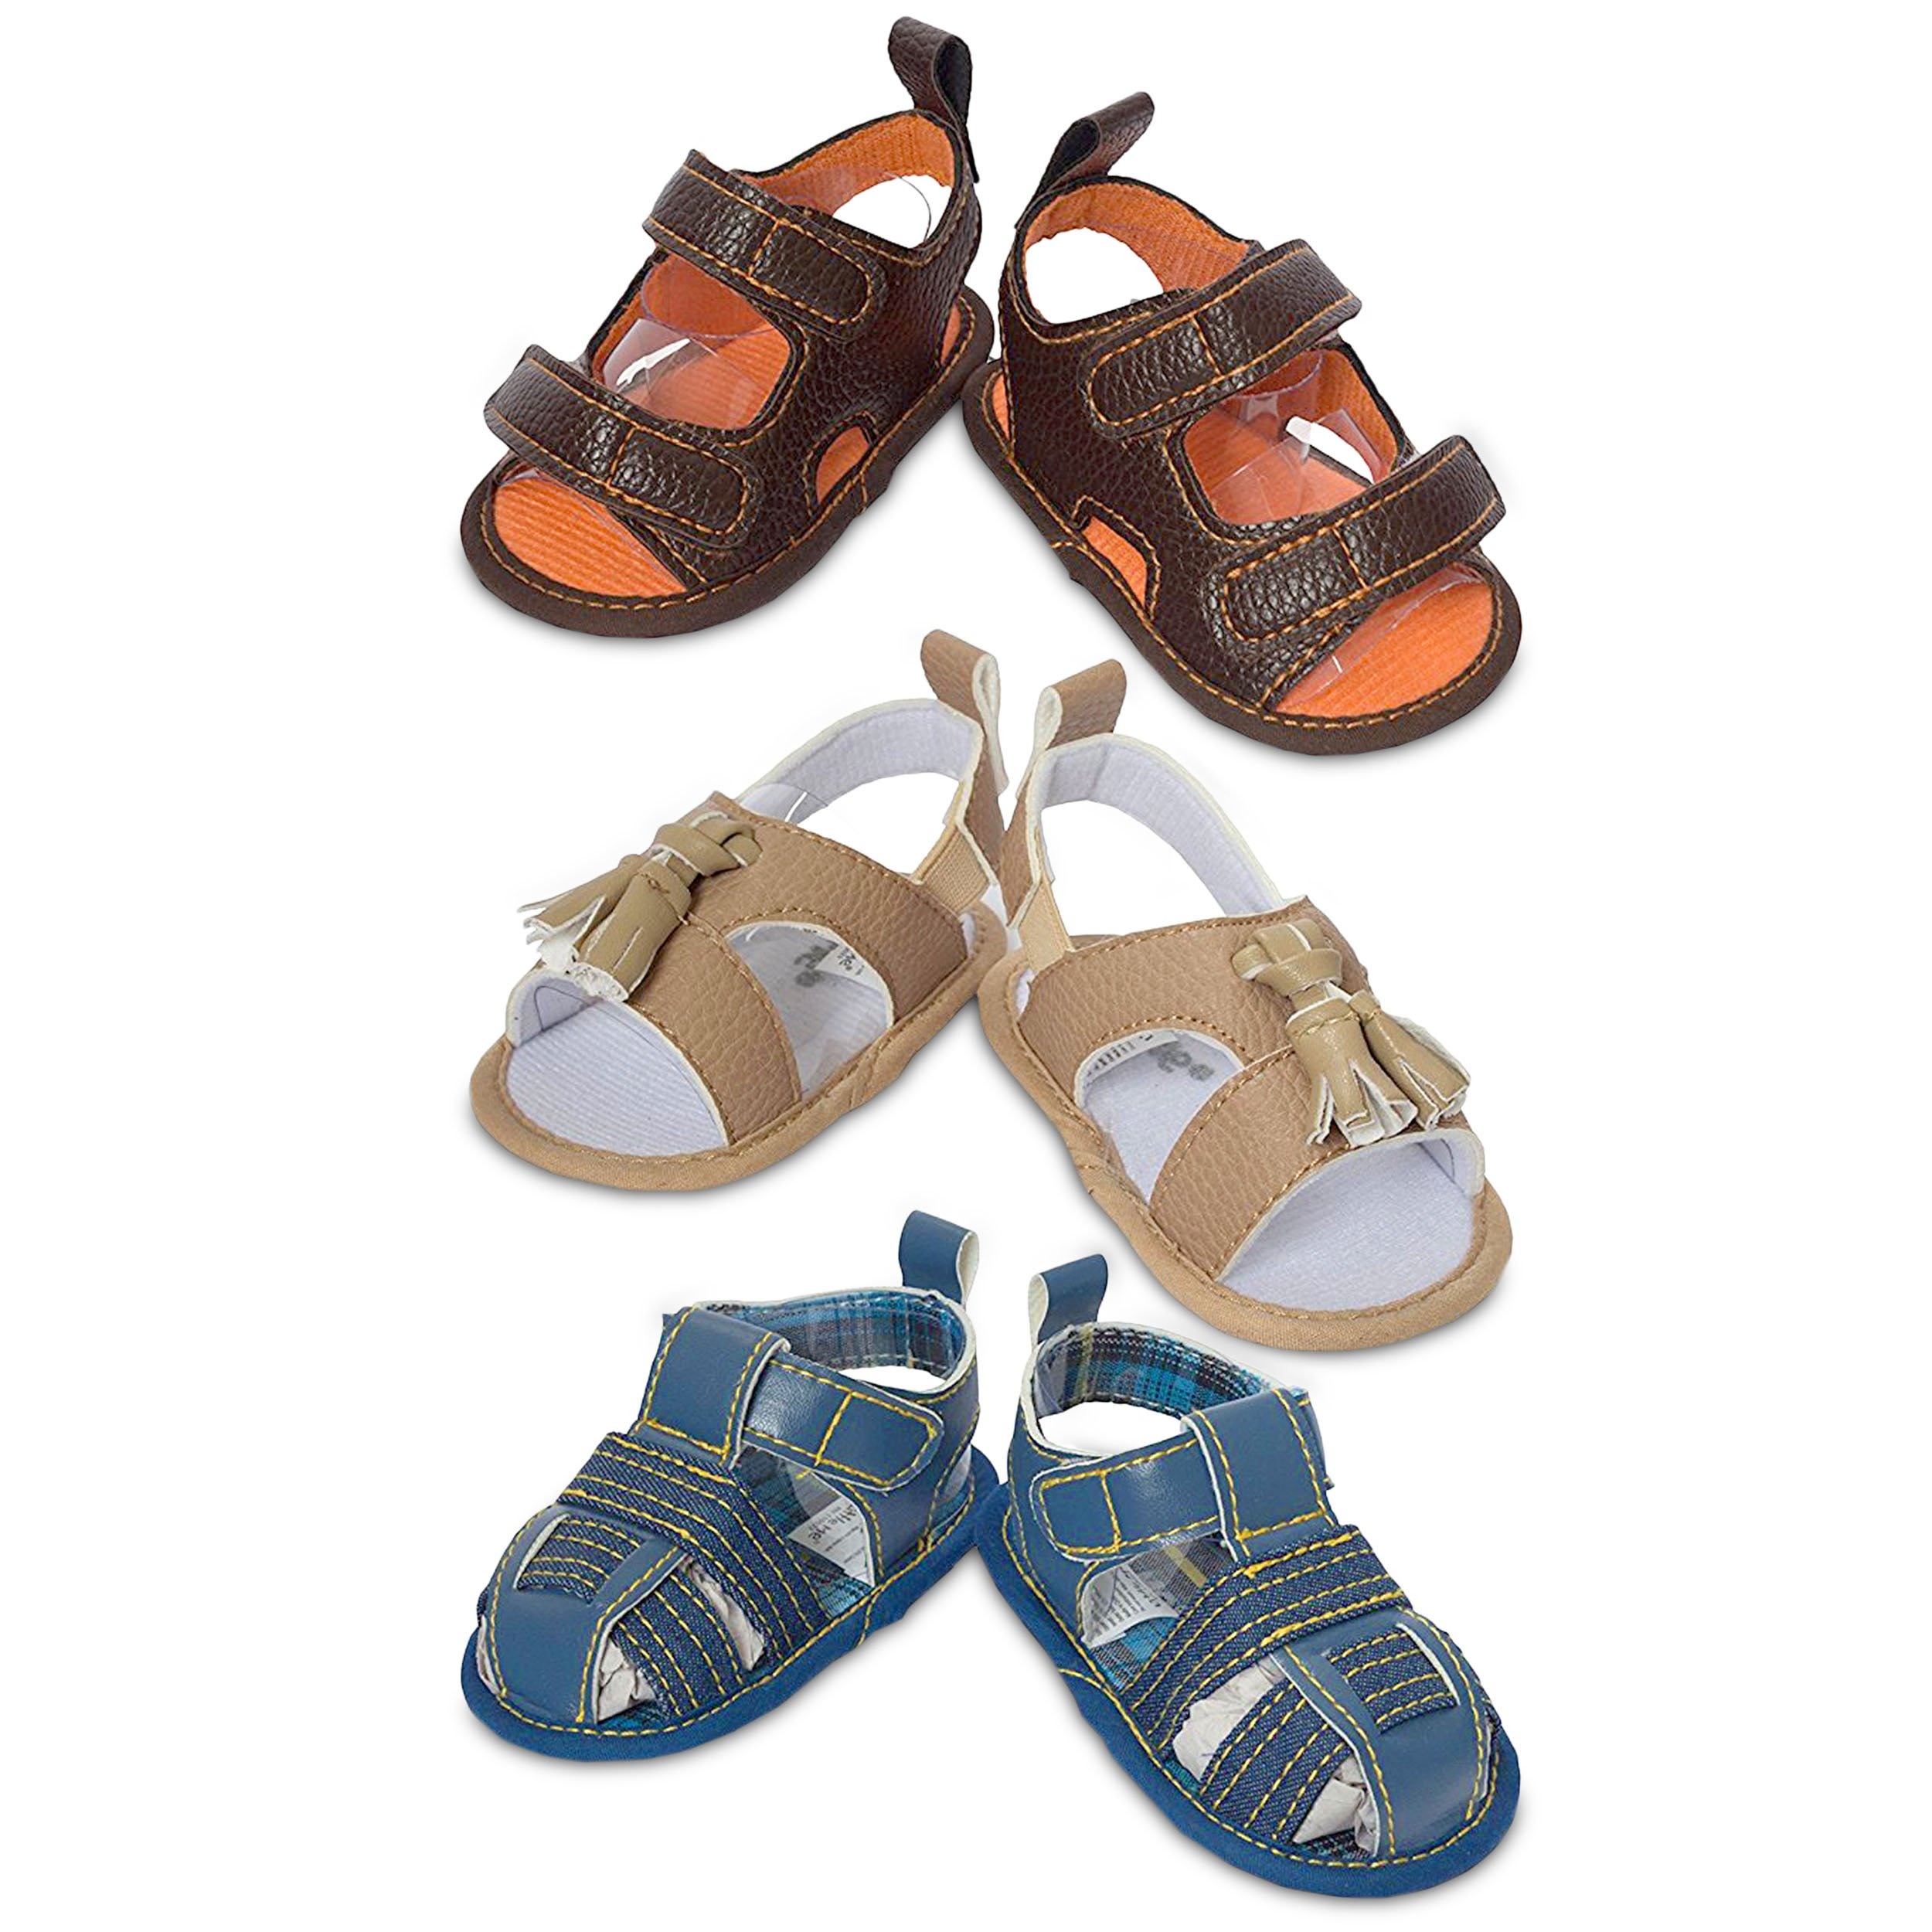 08c182f53b647 3 Pack Baby Infant & Newborn Boys Sandals- Soft Sole Baby Prewalker ...